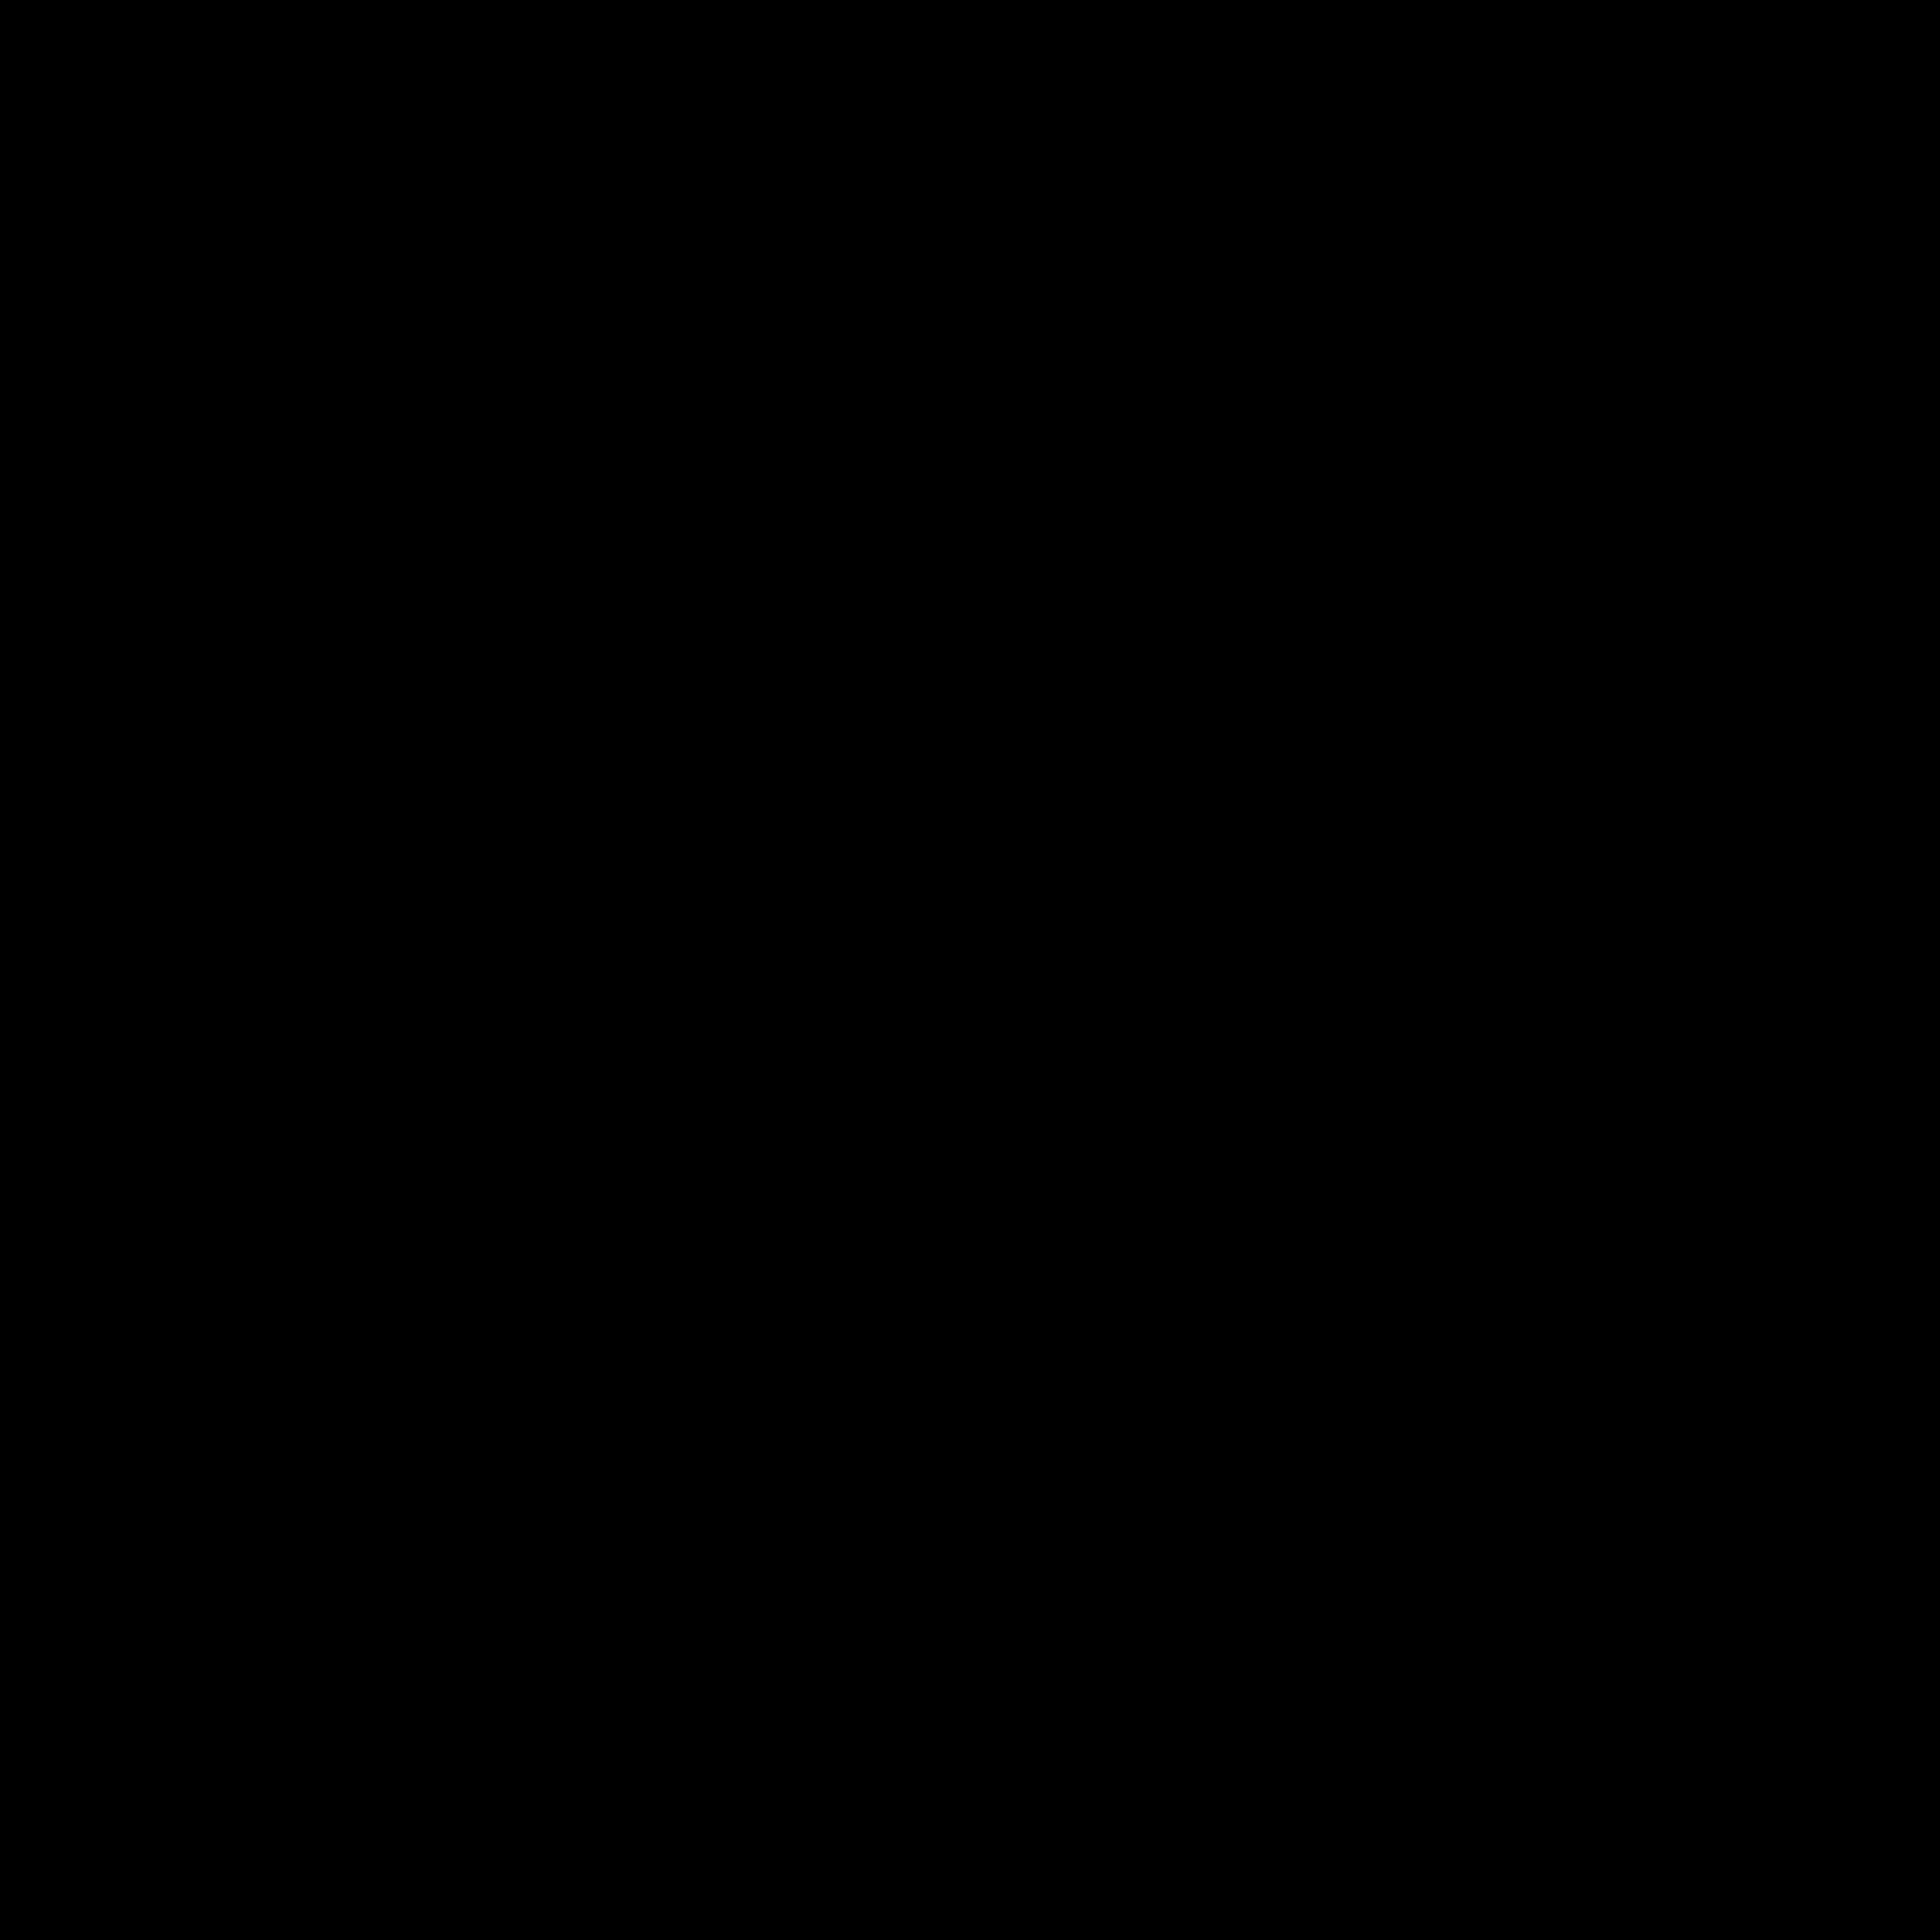 banner freeuse Progress logo png transparent. Tech vector black